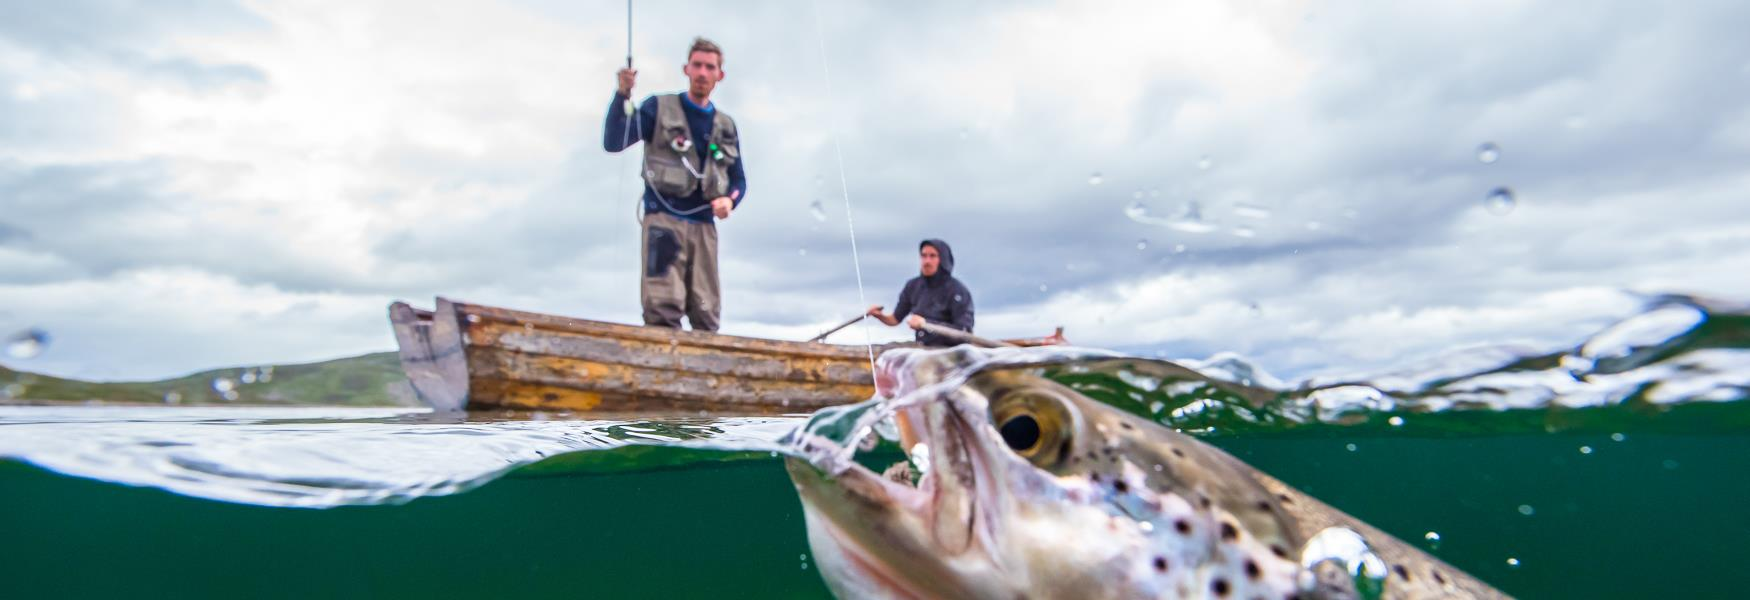 Fishing, boat, man fishing, trout